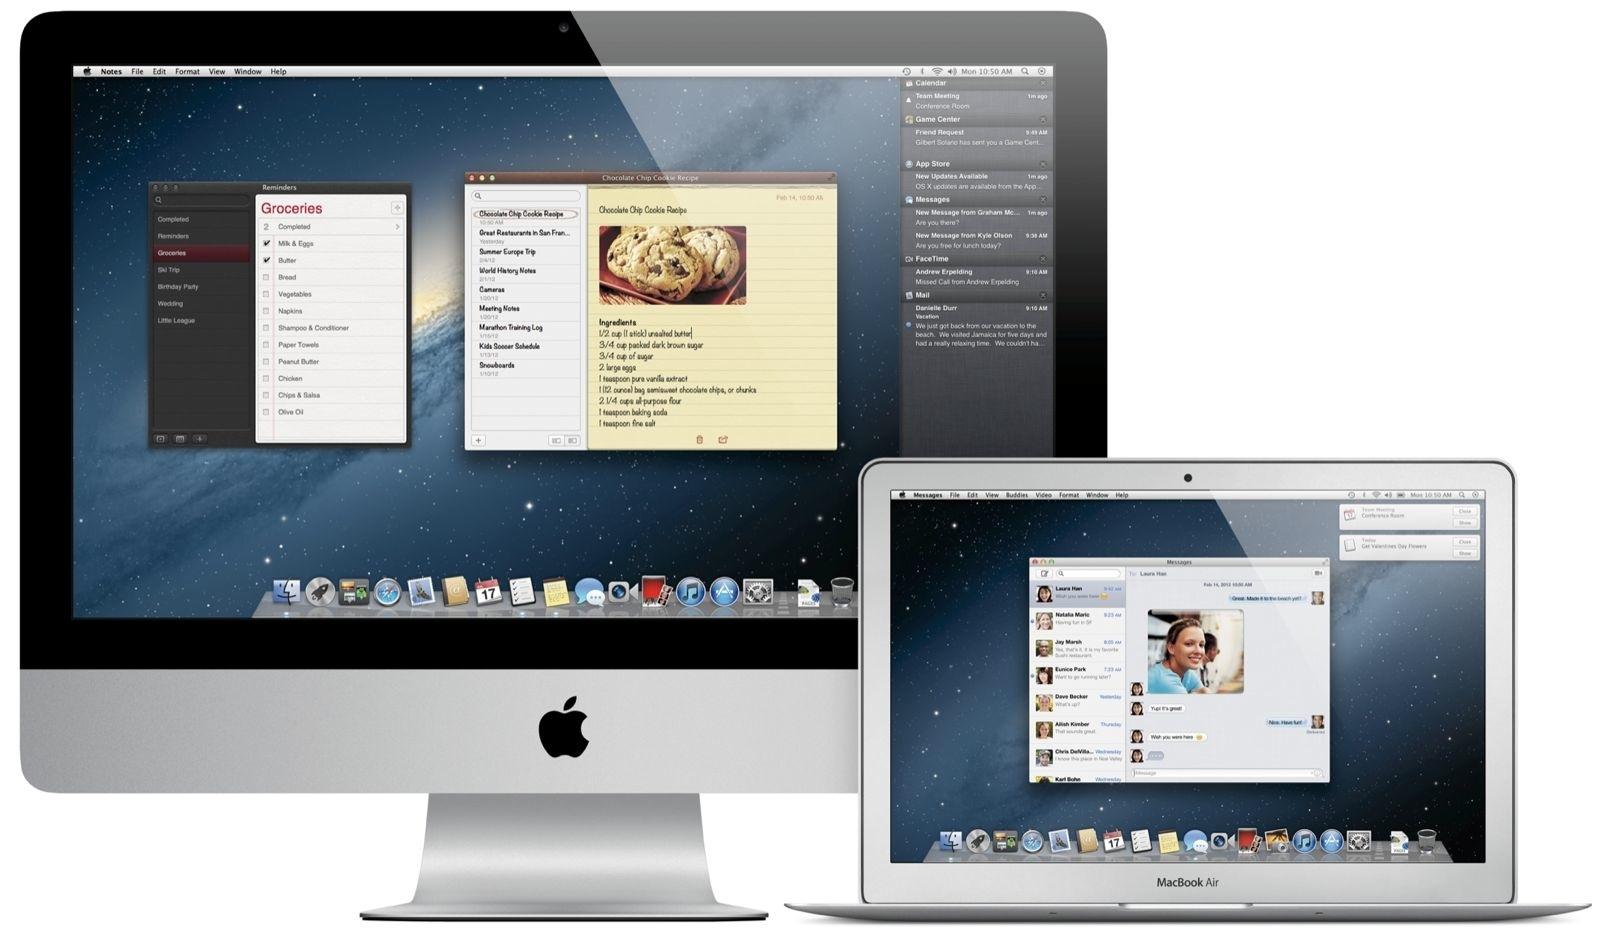 Come aprire file exe su Mac: guida pratica